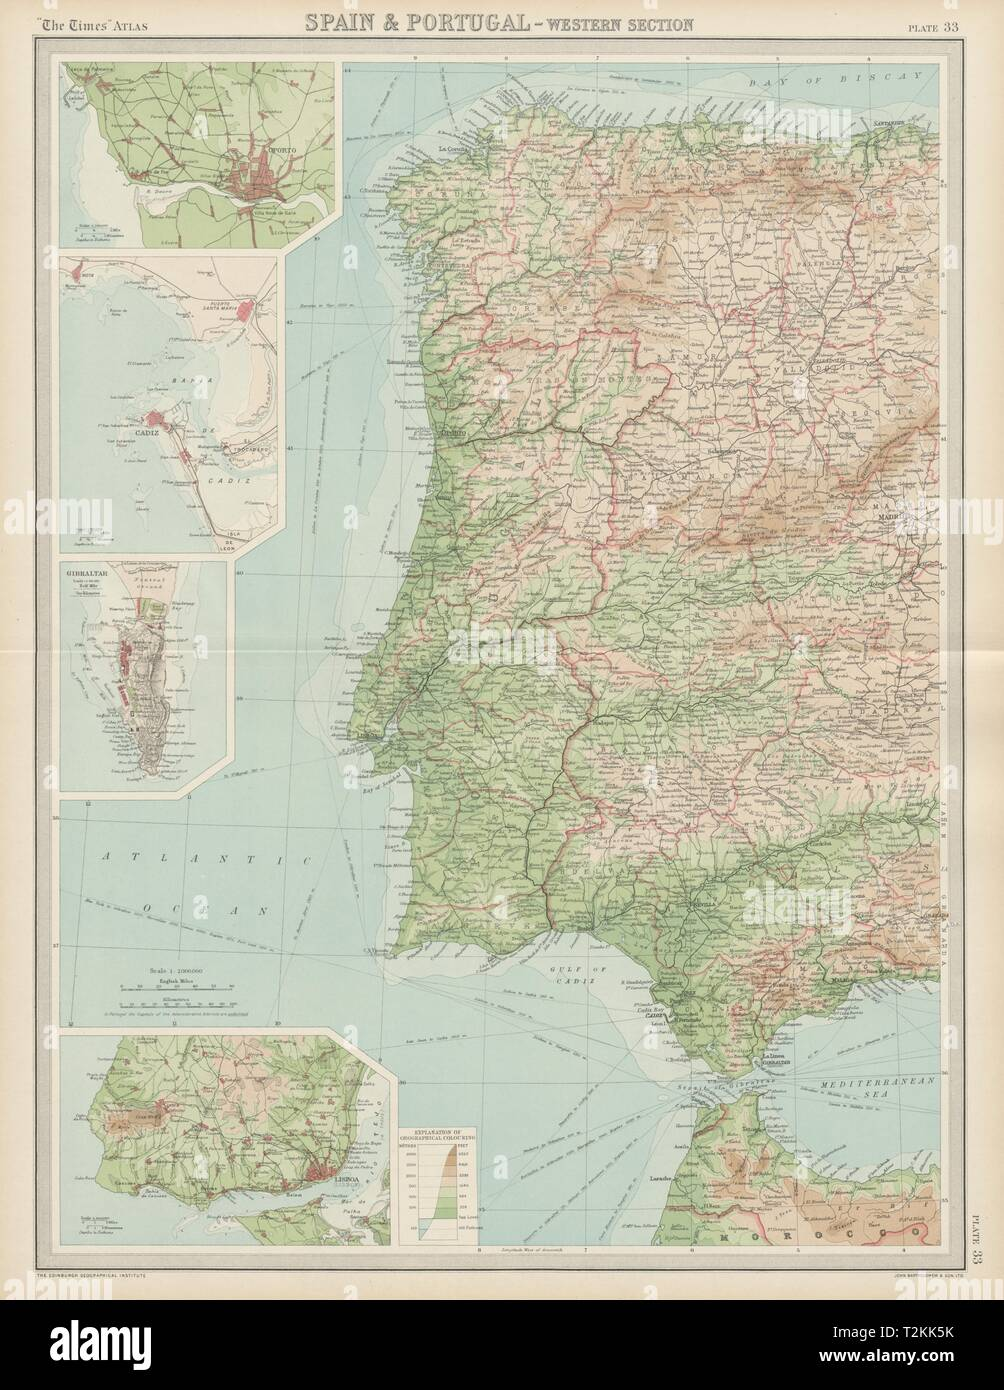 Map Of Western Spain And Portugal.Western Spain Portugal Iberia Lisbon Gibraltar Oporto Cadiz